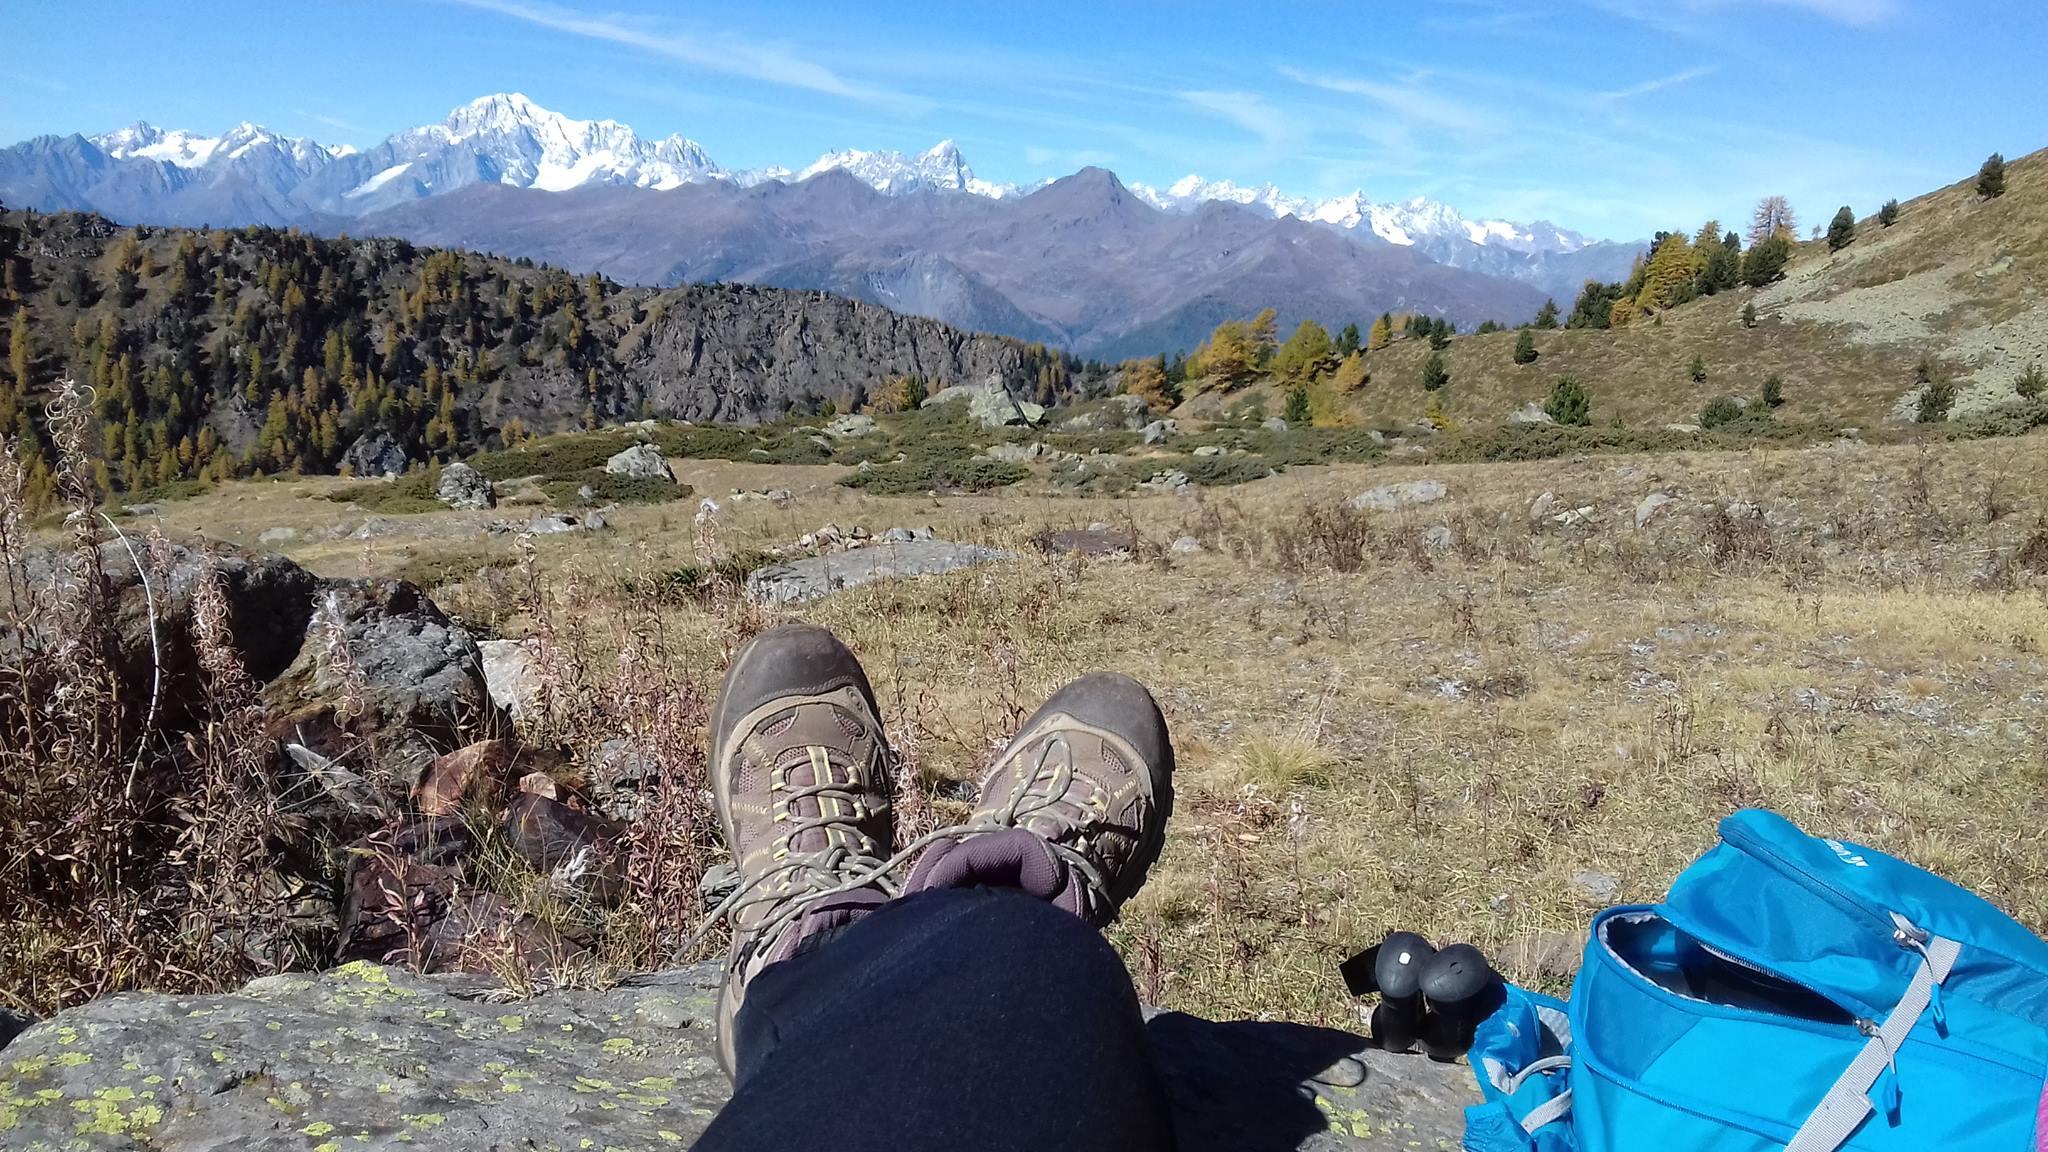 Yoga und Wandern im Aosta-Tal (Italien) - mit Ilaria